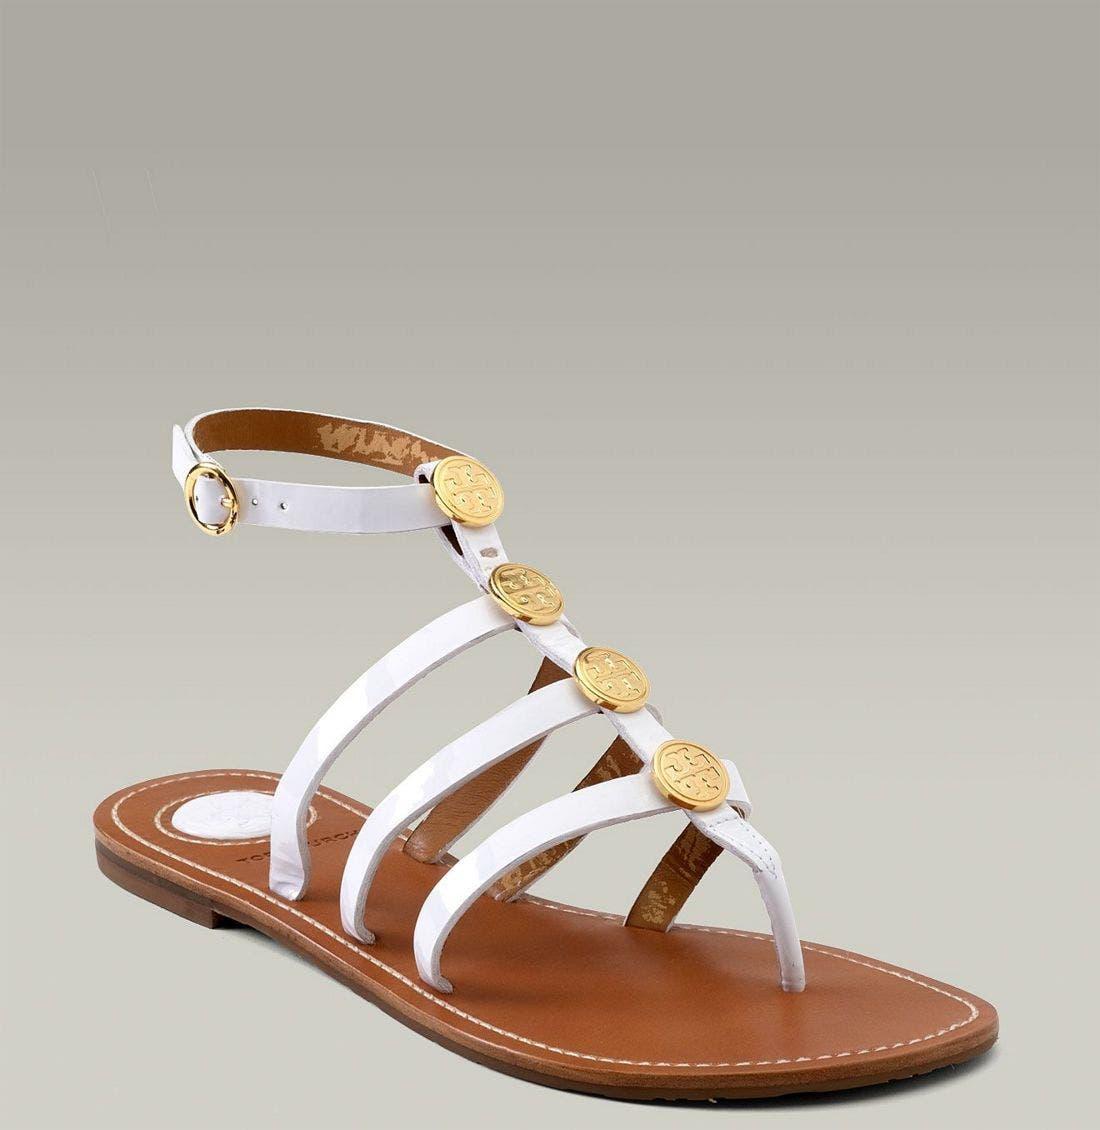 Tory Burch 'Alexis' Gladiator Sandal